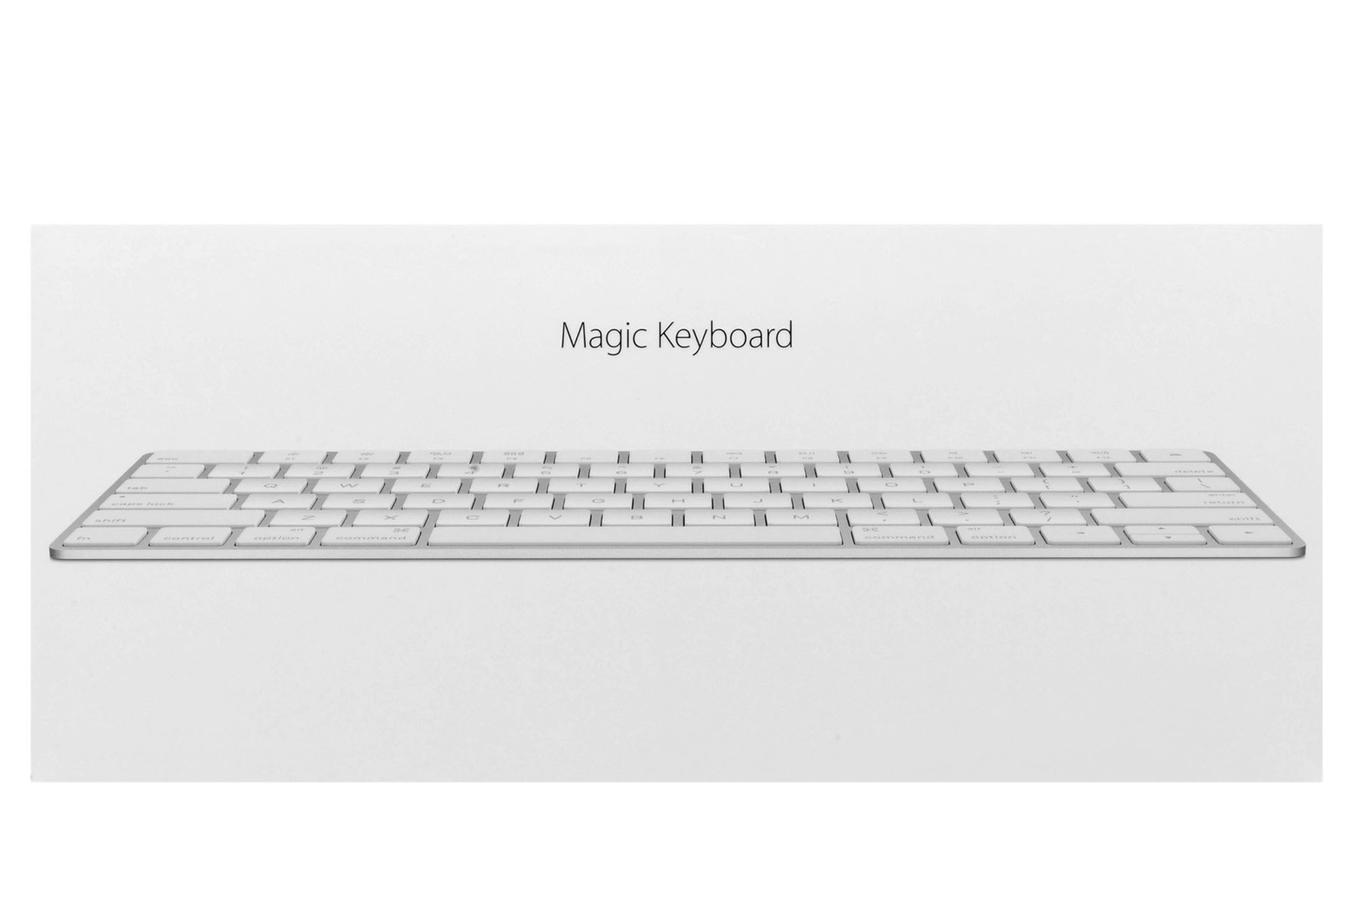 clavier apple magic keyboard 4180496 darty. Black Bedroom Furniture Sets. Home Design Ideas